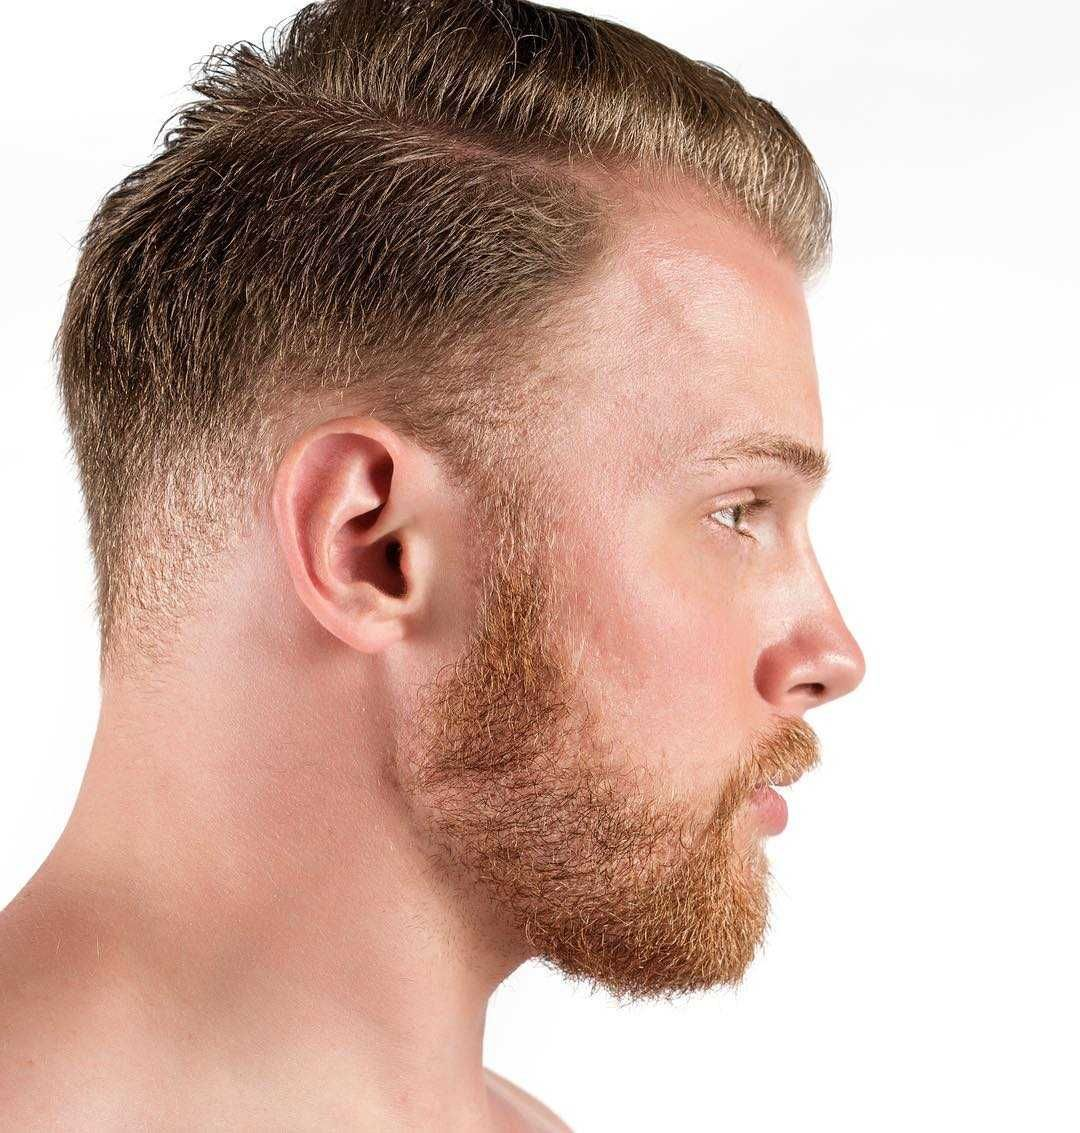 Mens haircut fade justlifestyle shared a photo from flipboard  men hair  pinterest